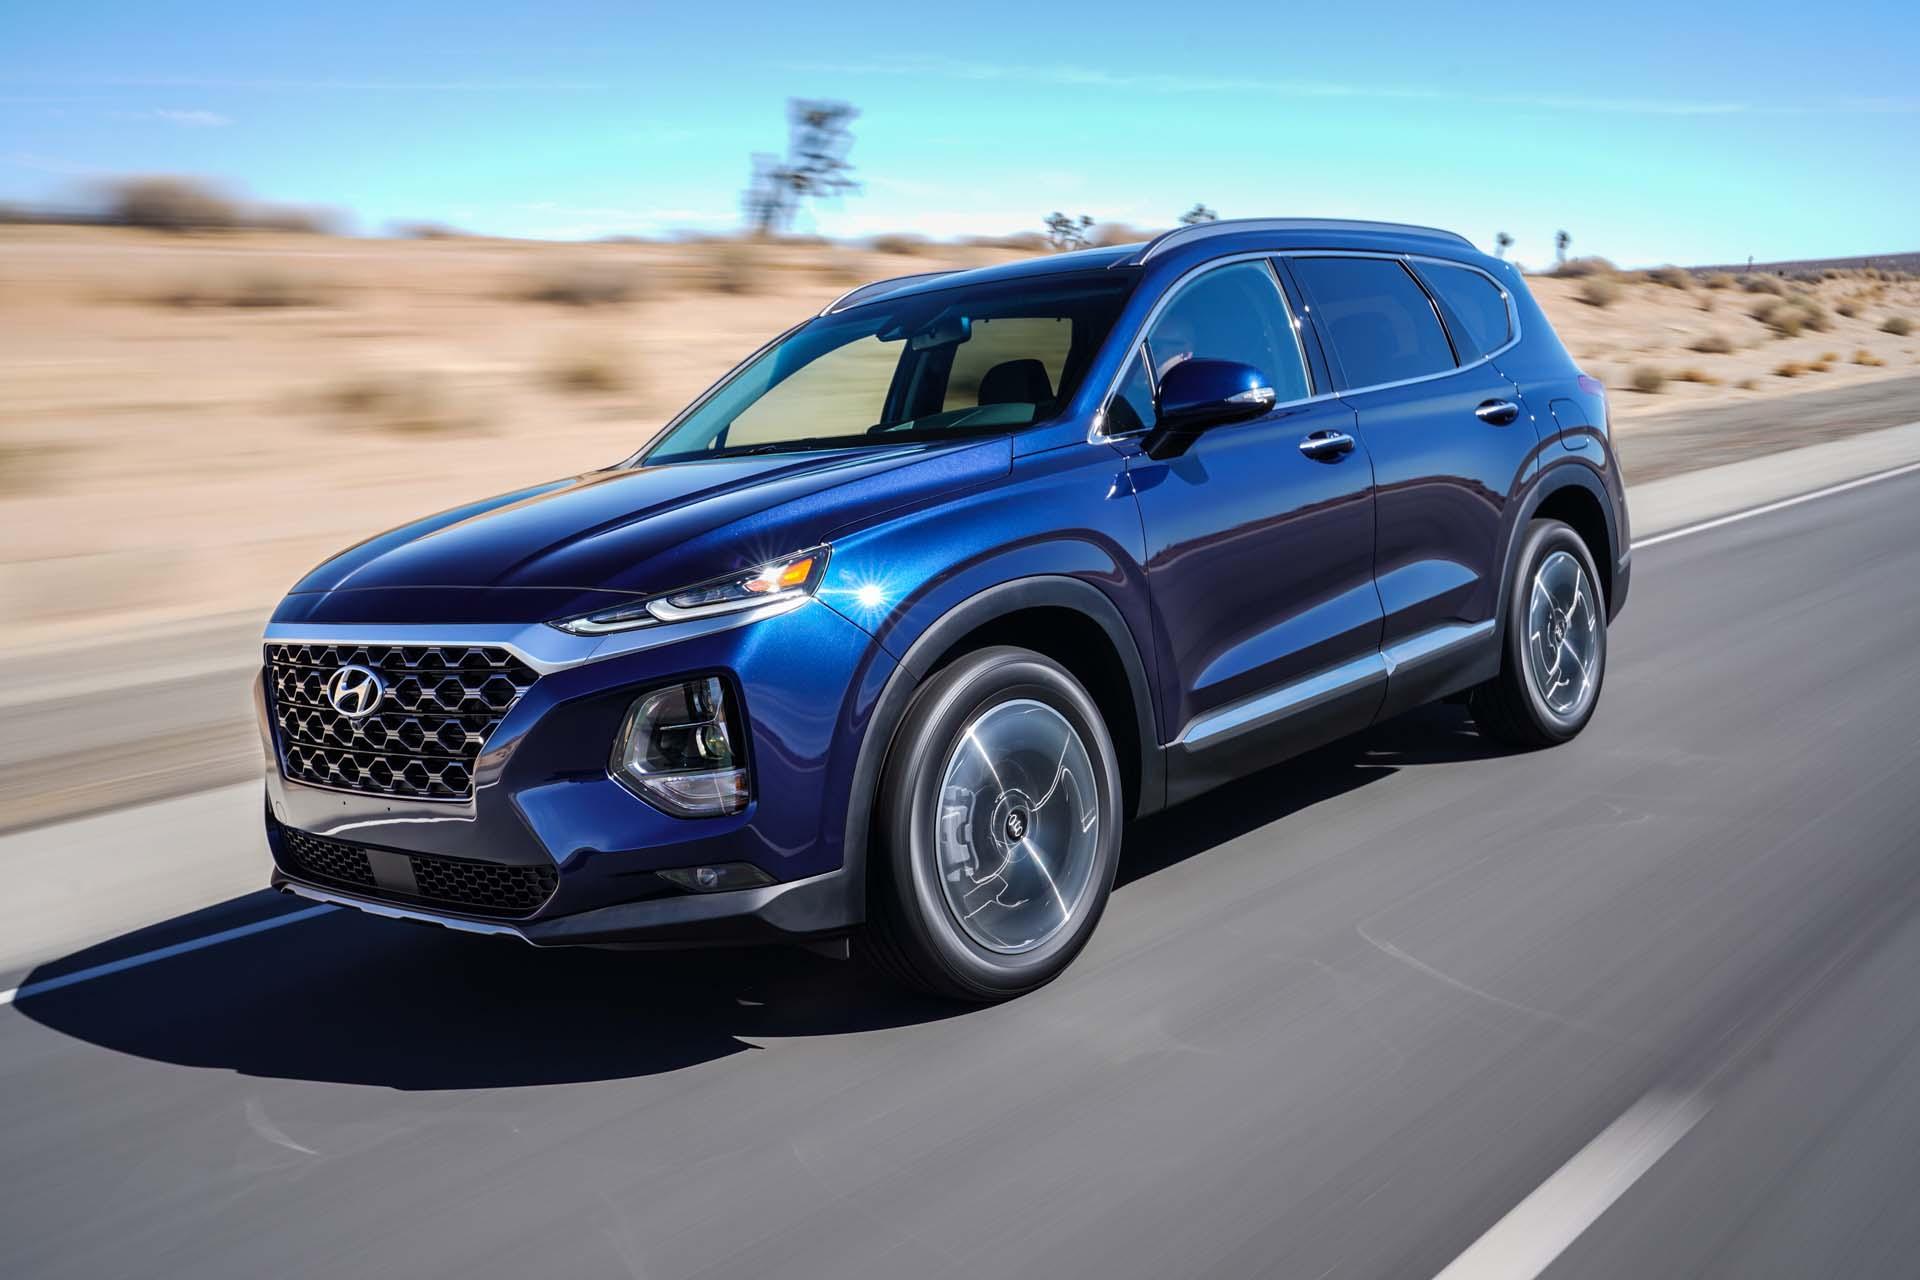 2019 Hyundai Santa Fe Review Ratings Specs Prices And